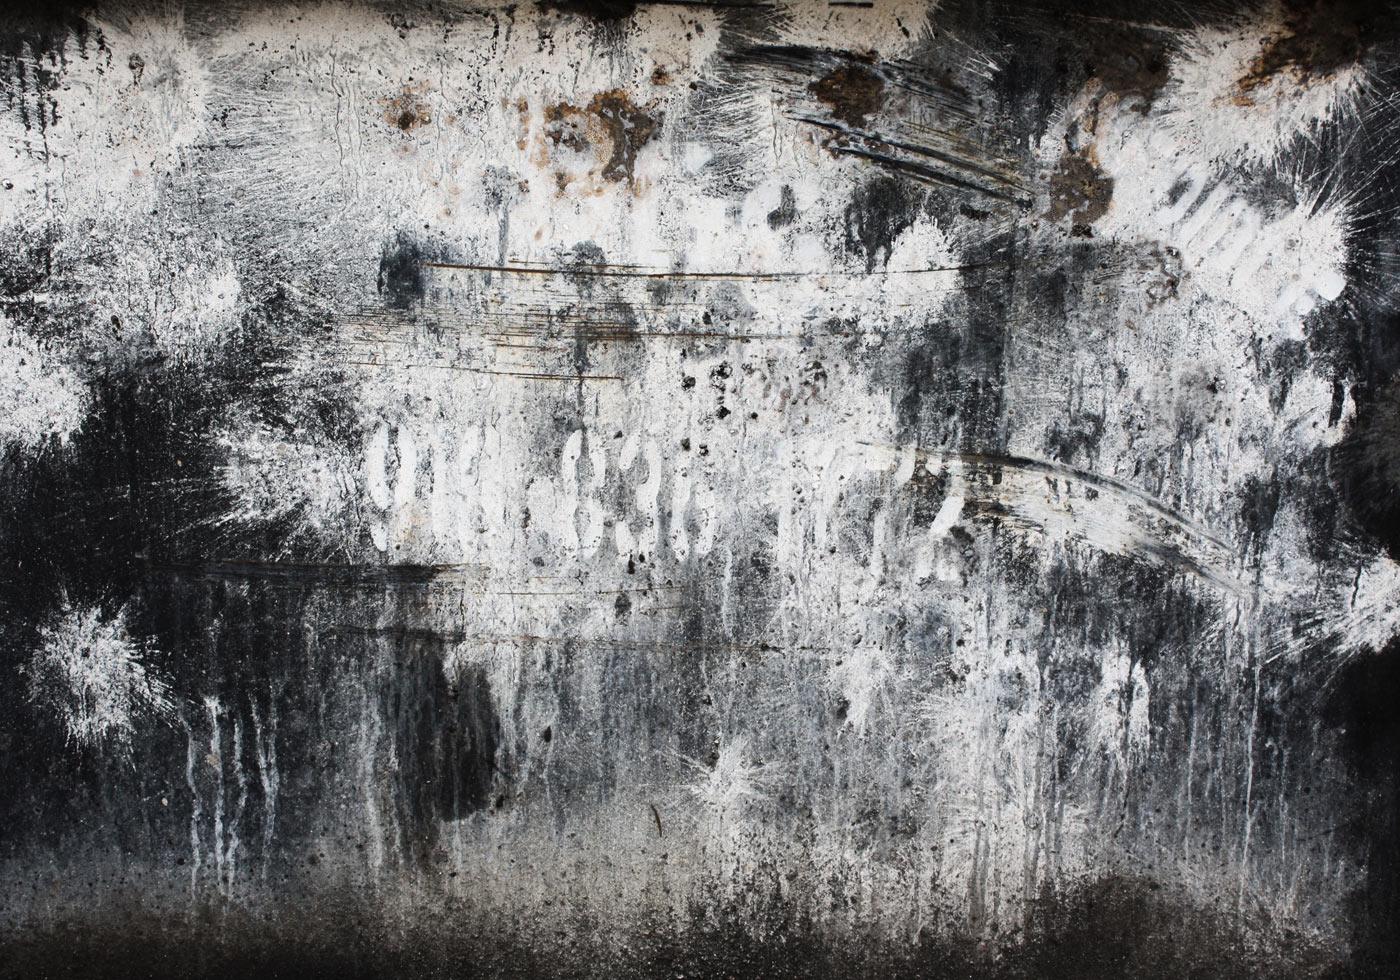 Concrete Texture Free Photoshop Brushes At Brusheezy